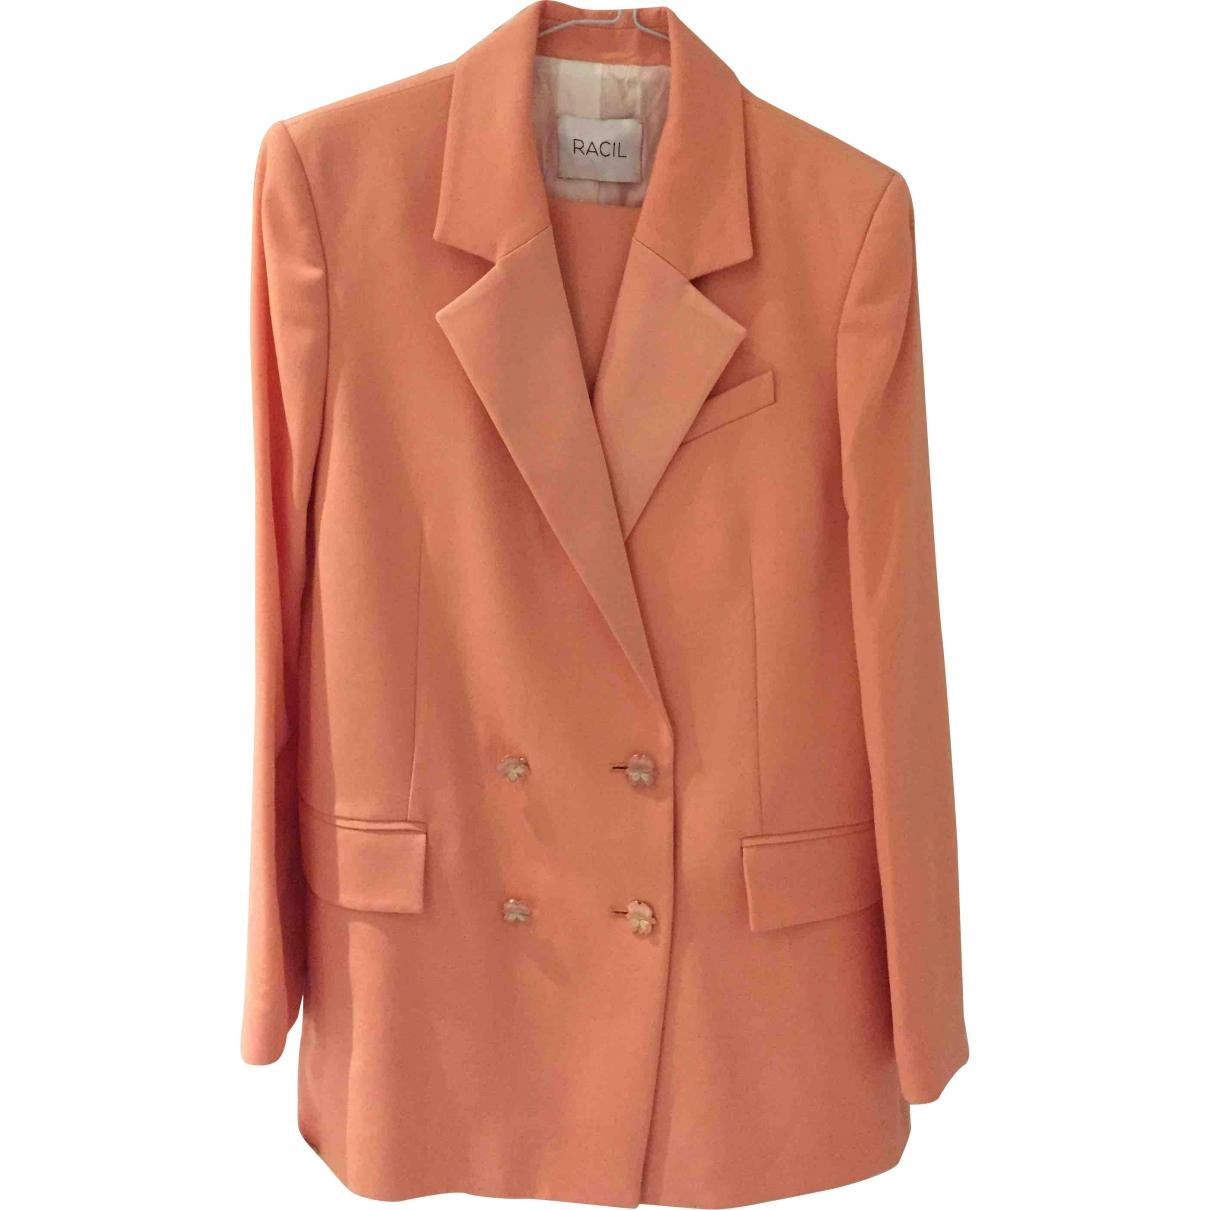 Racil \N Pink Wool jacket for Women 40 FR